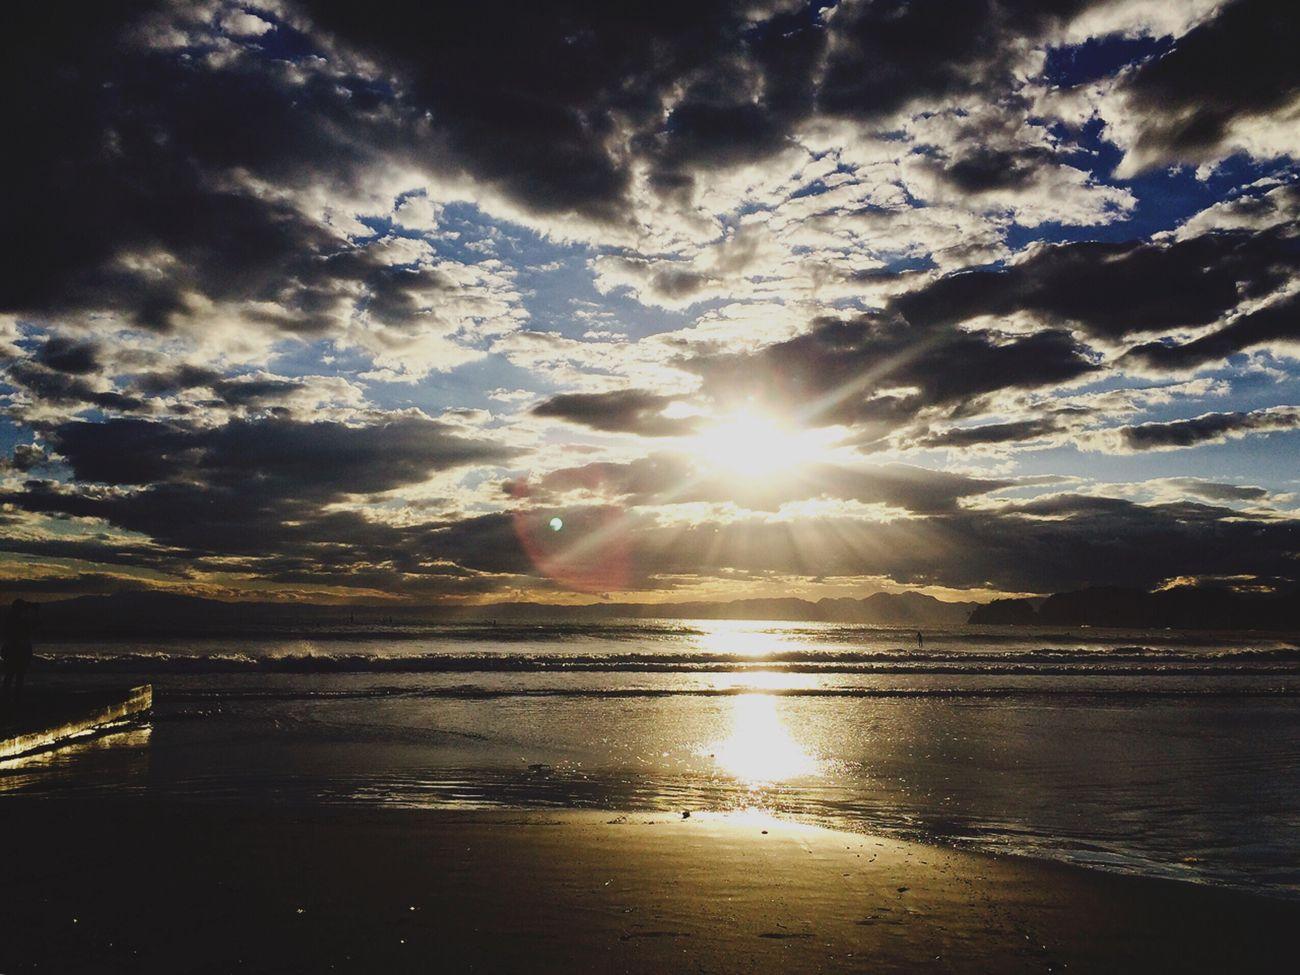 Cloud - Sky Cloud Sun Beach Sea Reflection Beauty In Nature Sunset Shore Sky Sunbeam Cloudy 海 空 青 Enjoying The Sun Sea And Sky Seascape Landscape_Collection ✨✨✨✨🙏🏼